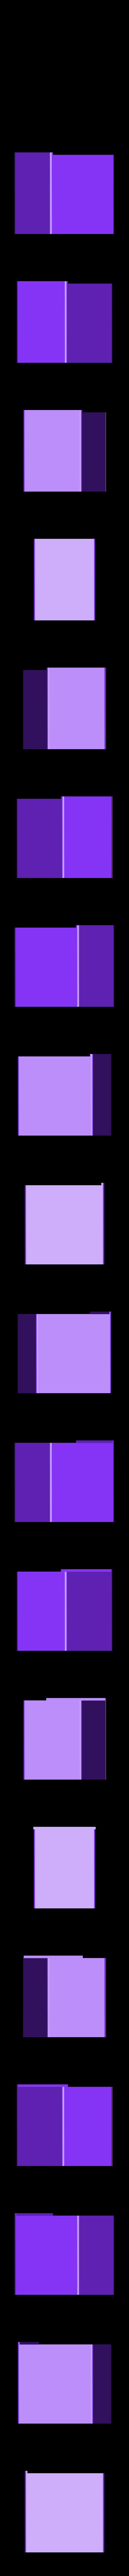 top.STL Download free STL file Triple Deck Box • 3D print model, Bolrod